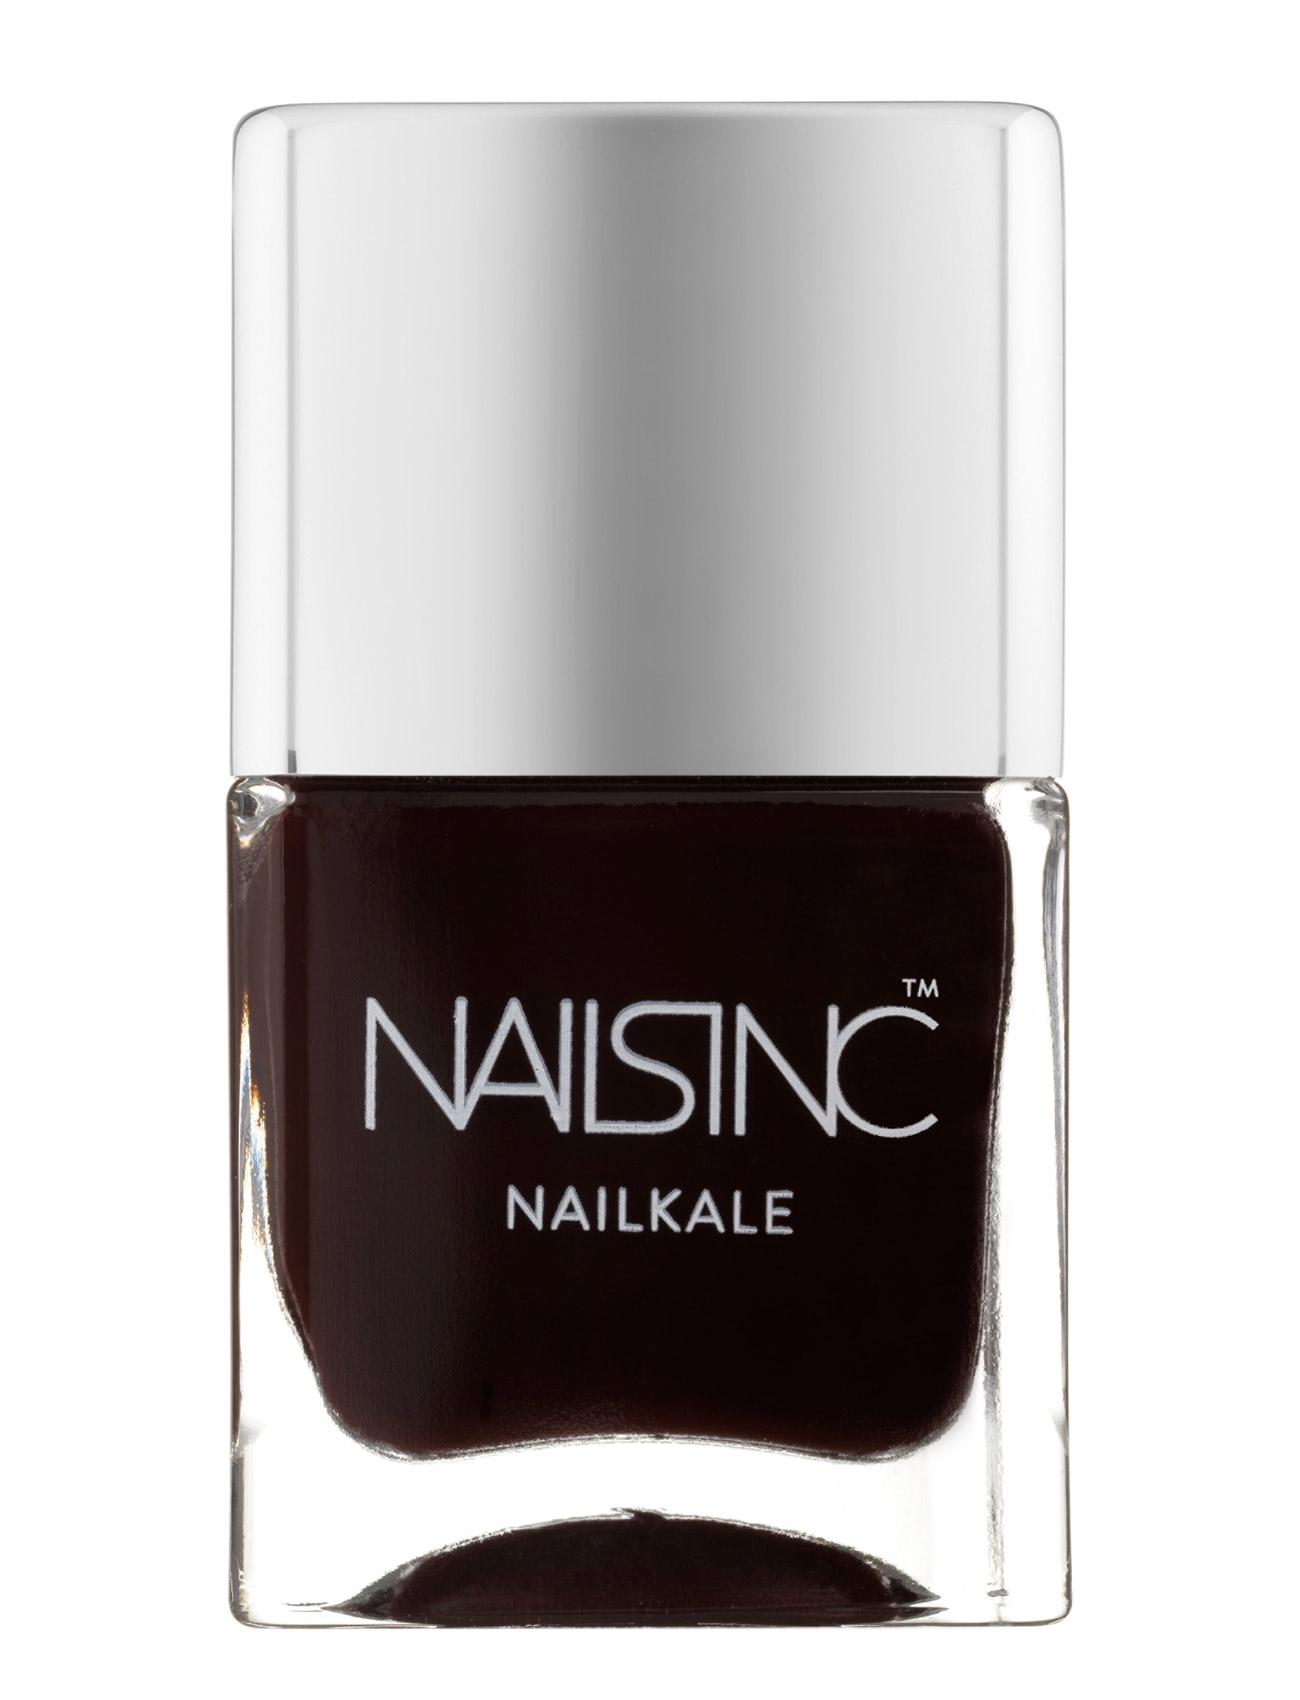 nails inc – Nailkale holland walk på boozt.com dk